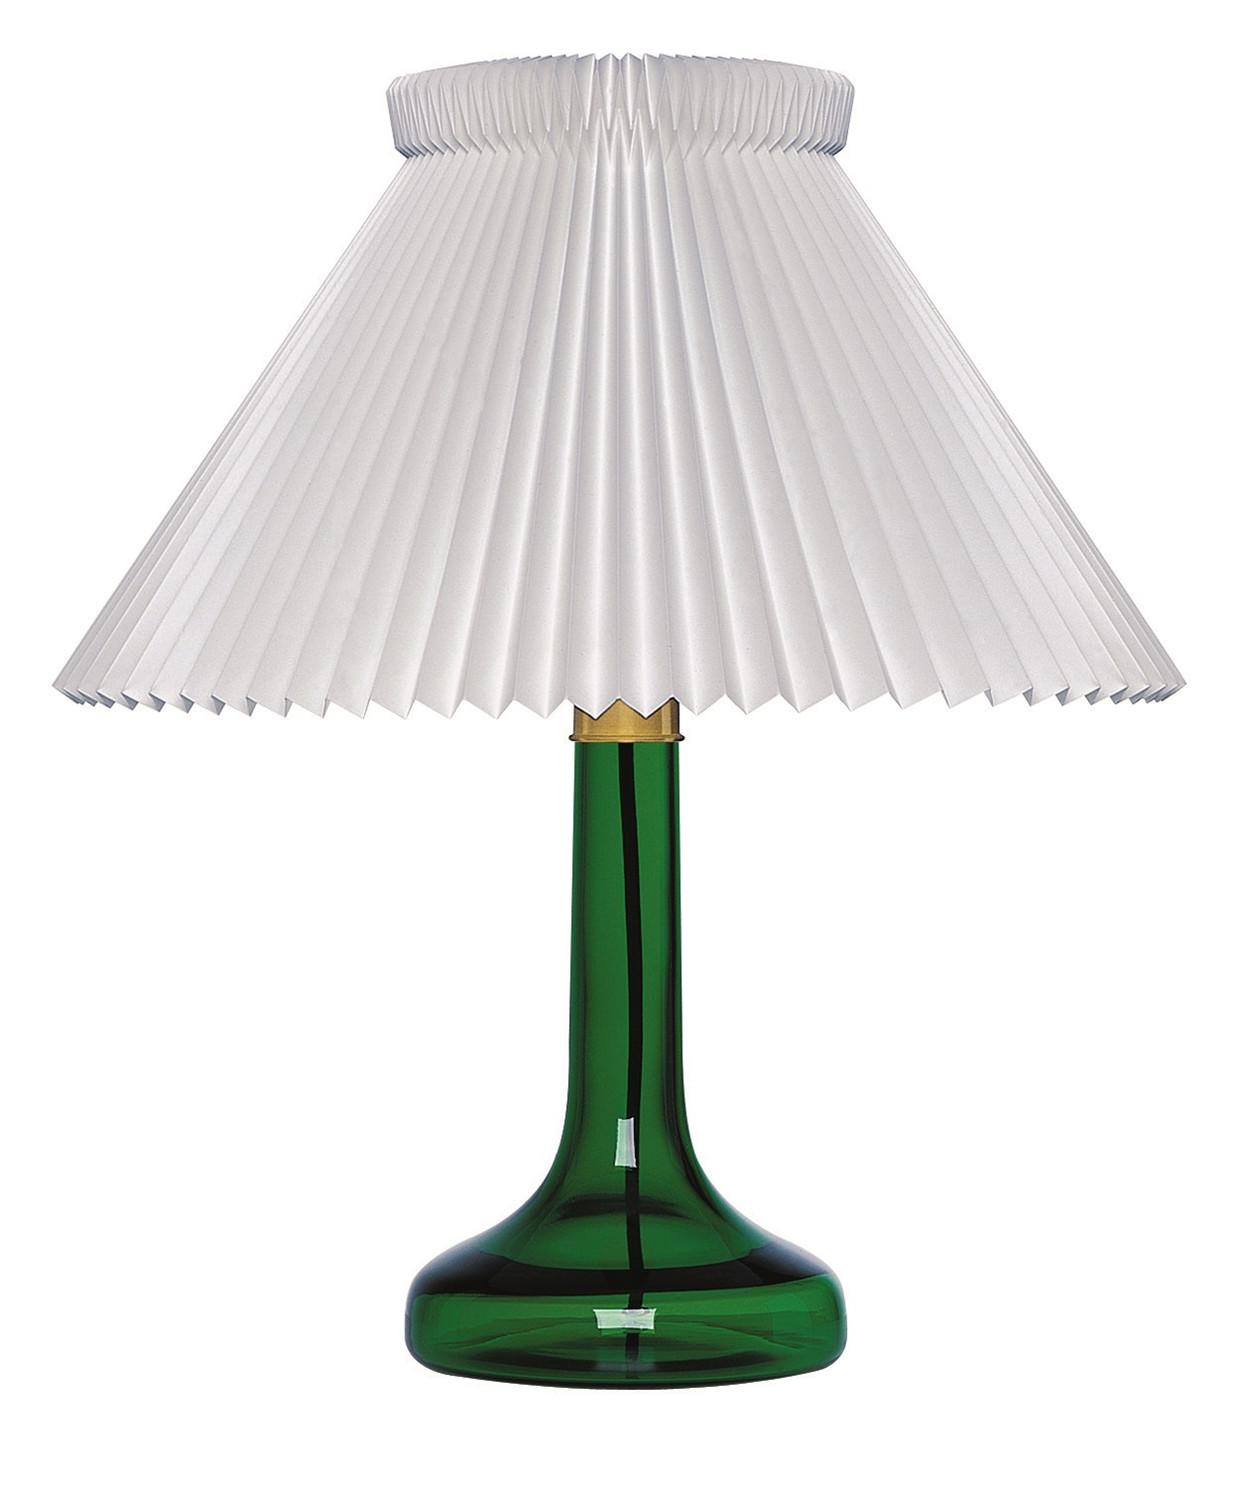 Le Klint Lampe Aarhus - Le Klint 343 Bordlampe Gron Le Klint